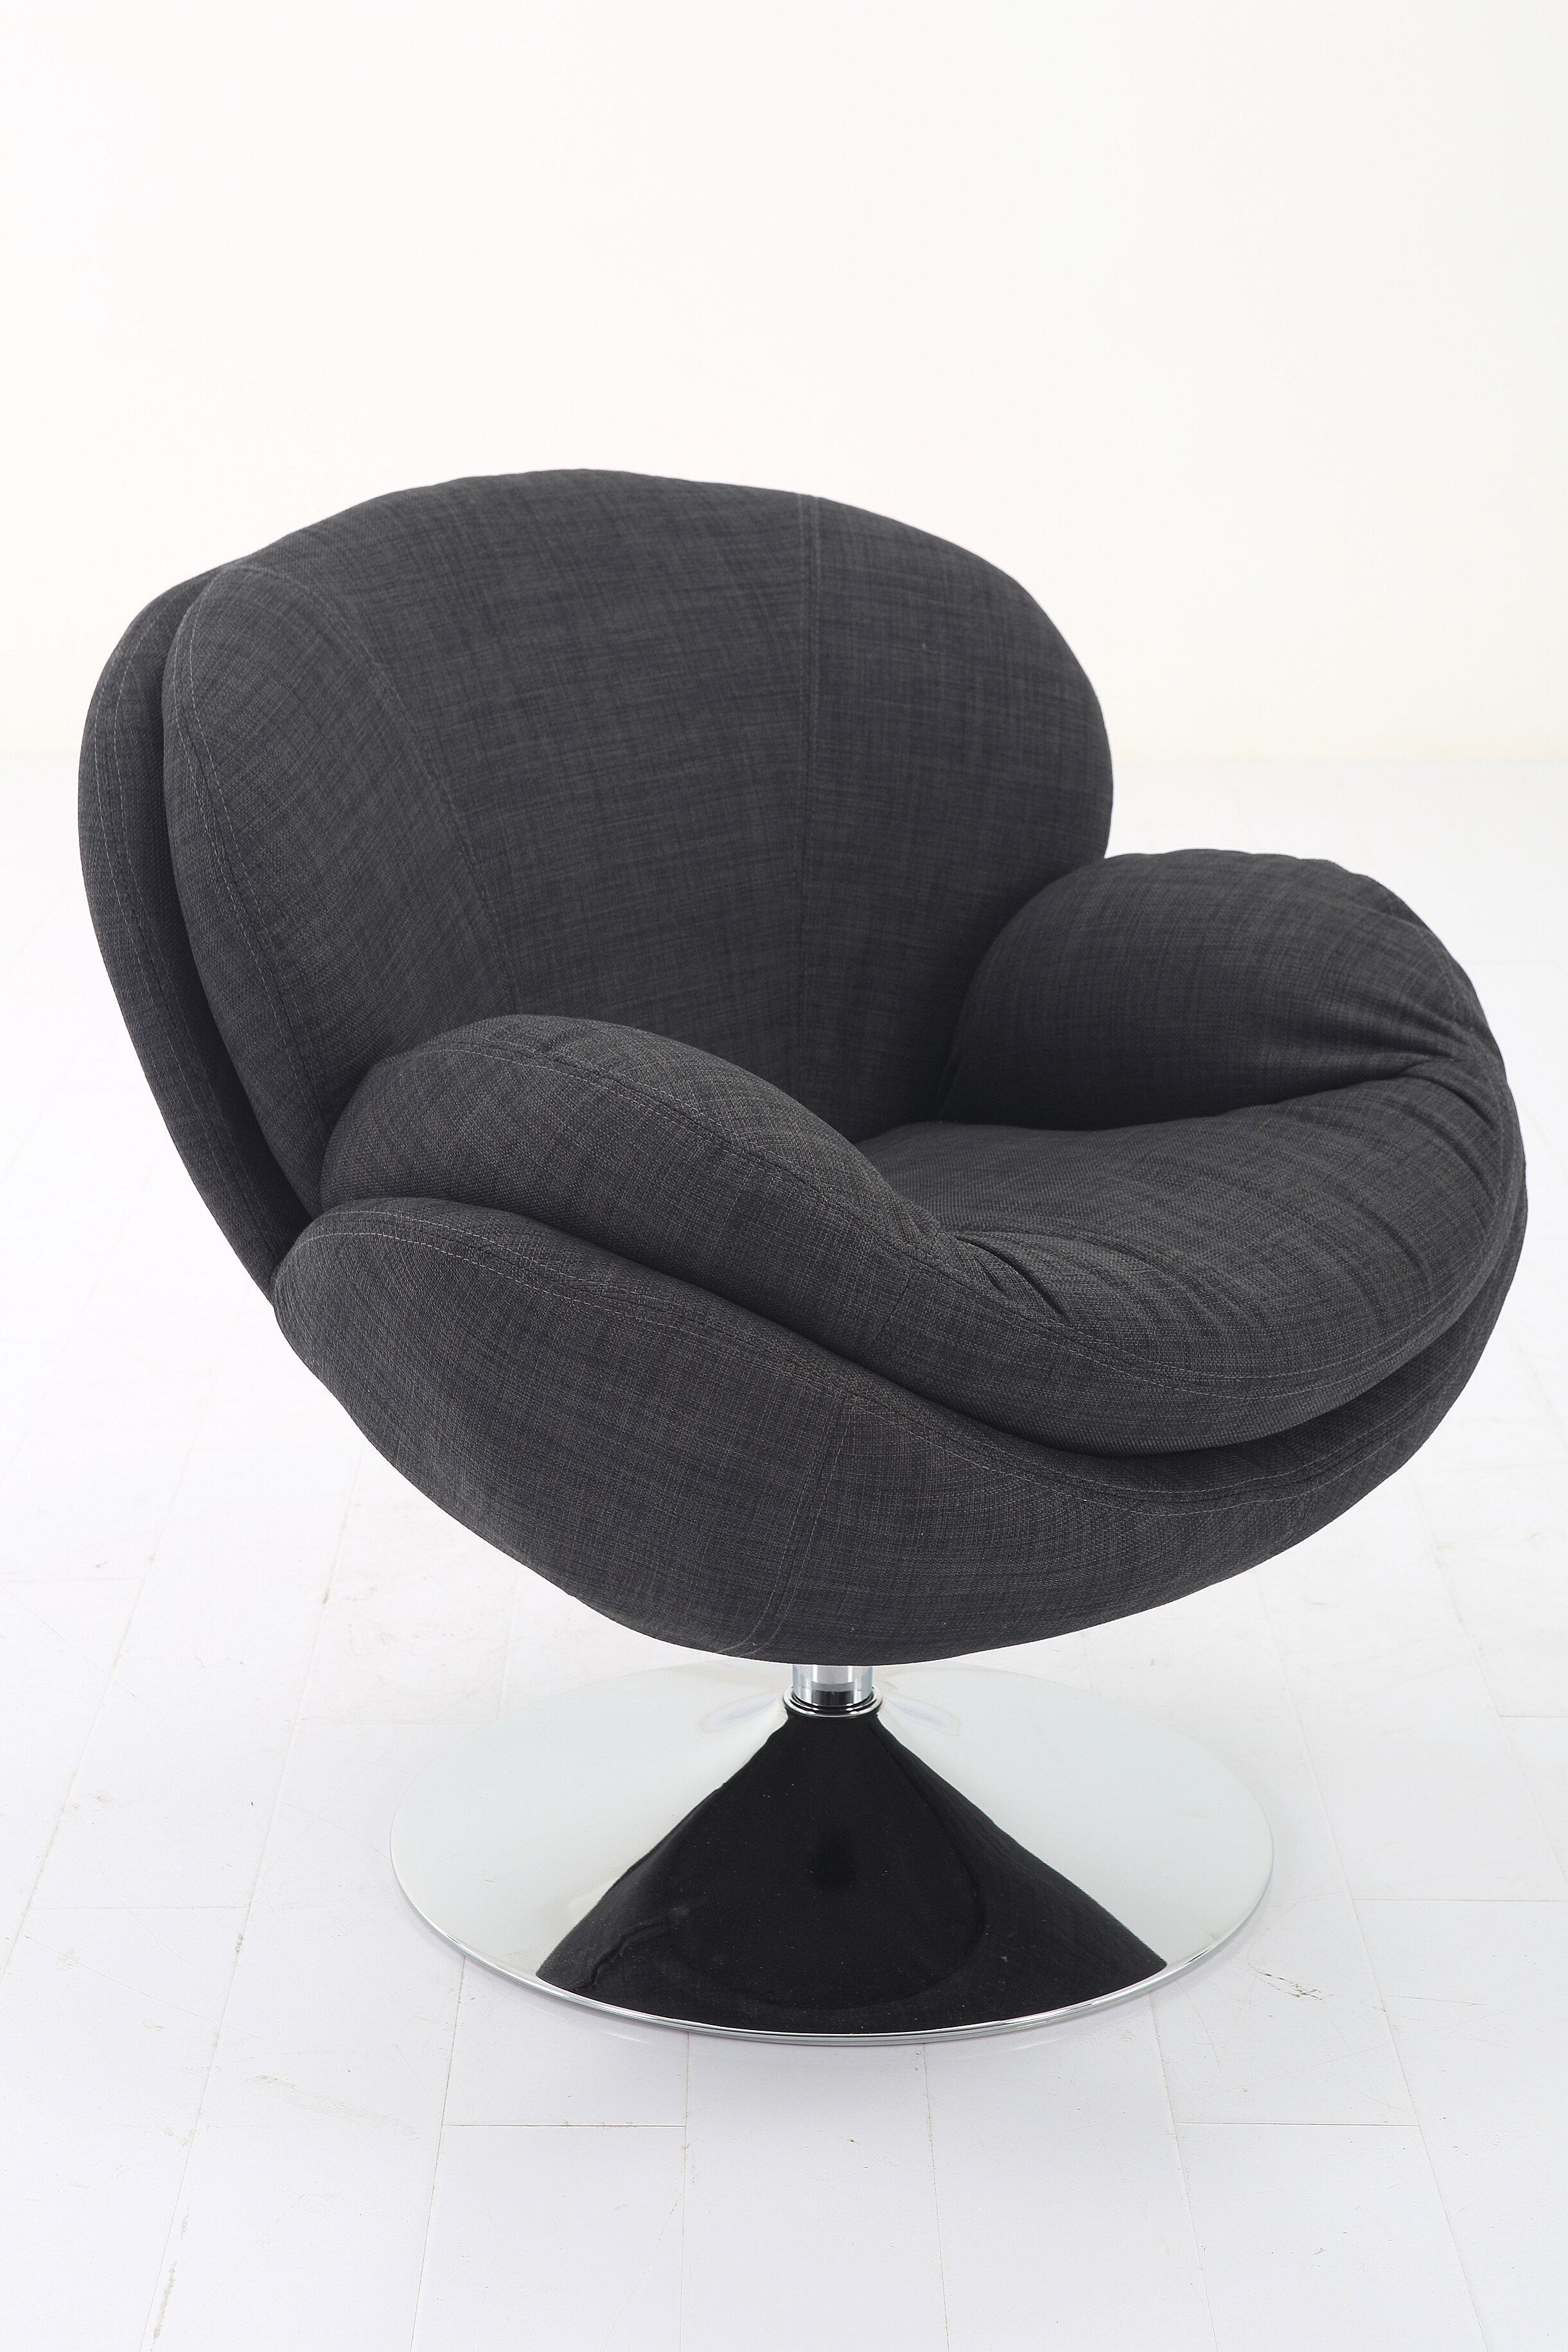 Coffield Swivel Lounge Chair